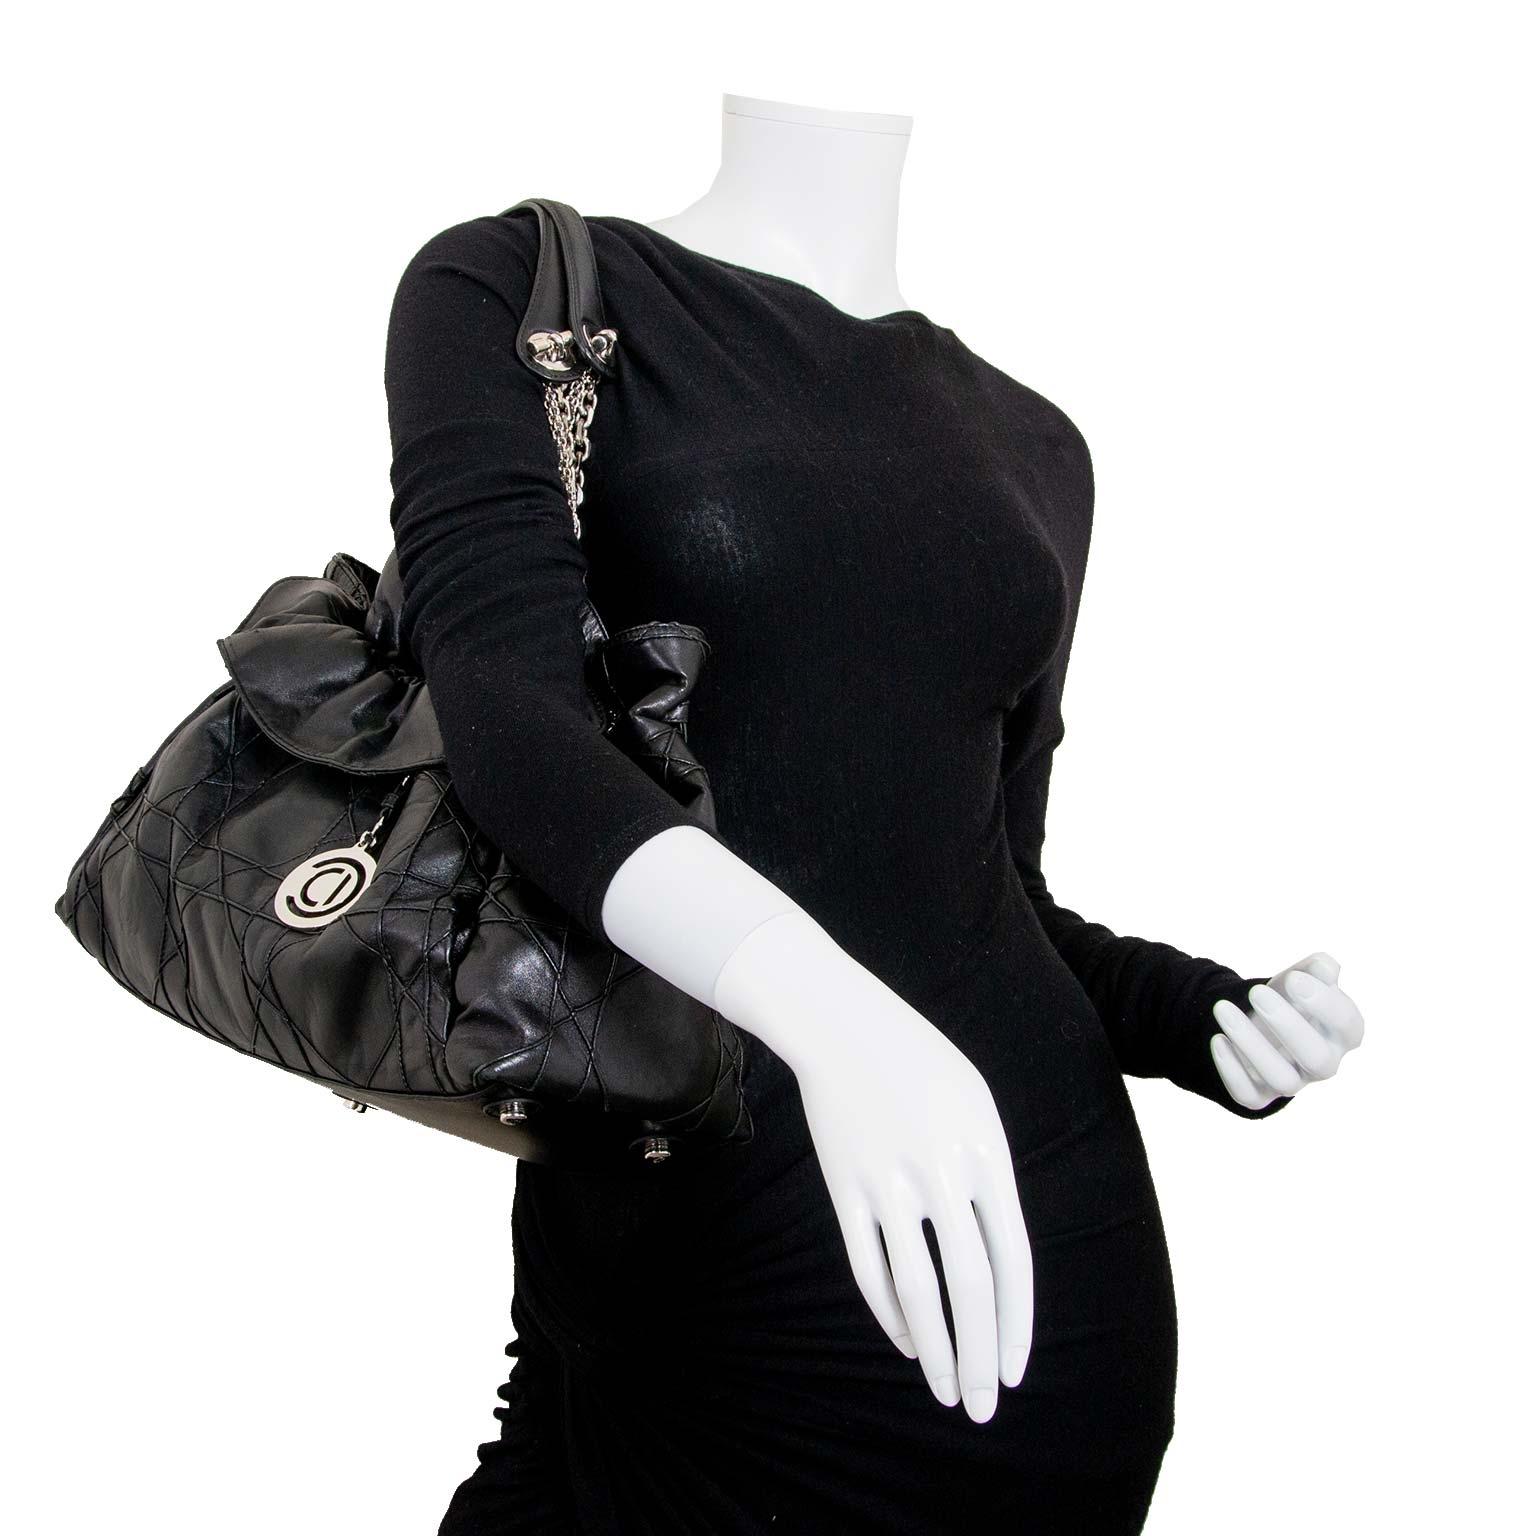 christian dior black le trente bag now for sale at labellov vintage fashion webshop belgium